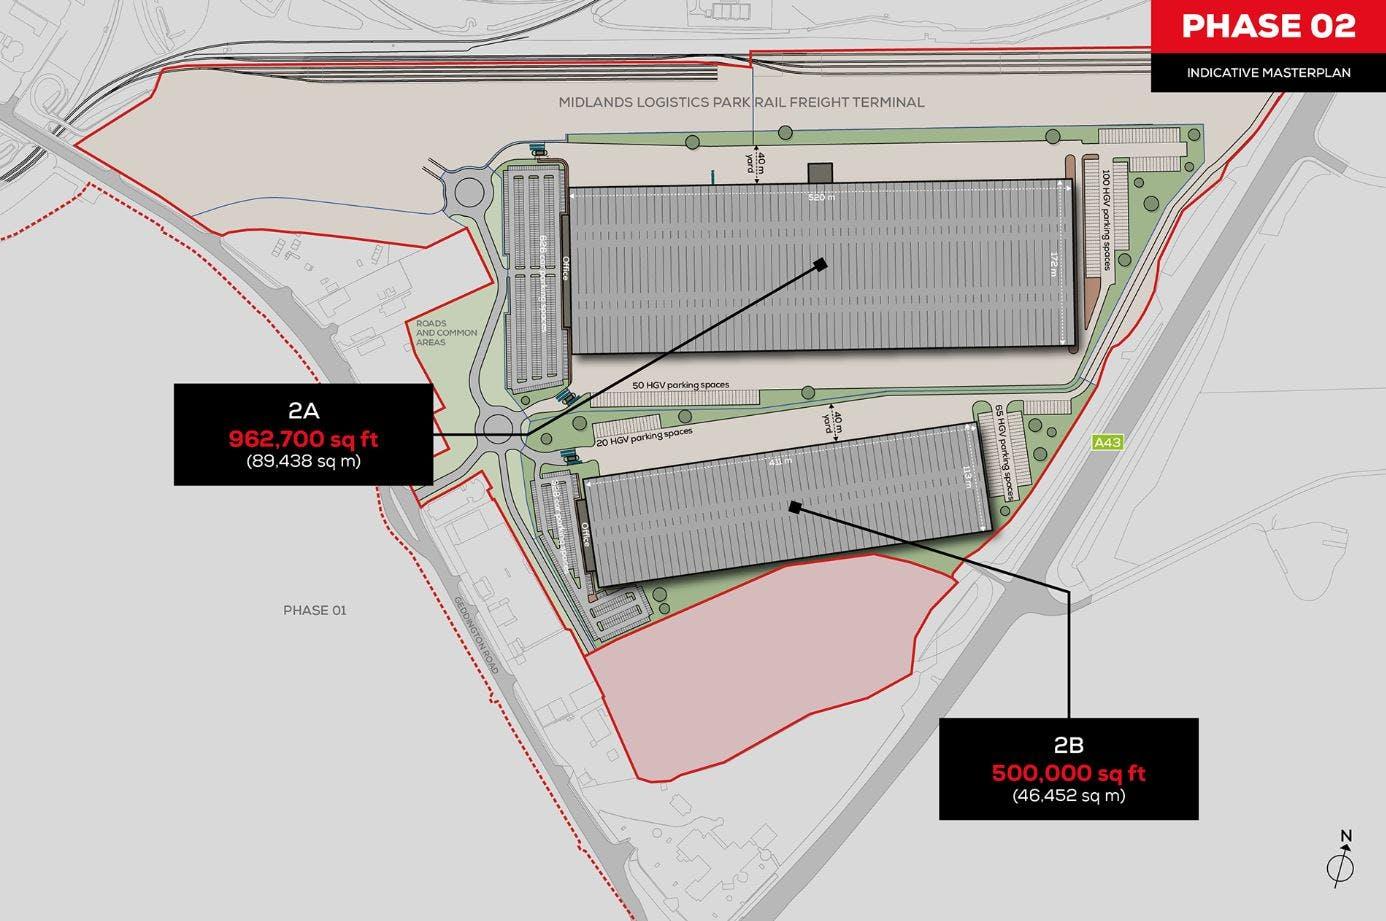 Midlands Logistics Park, Northamptonshire, Distribution Warehouse / Industrial (Multi Let Scheme) To Let - MLP Masterplan - PHASE 2.JPG